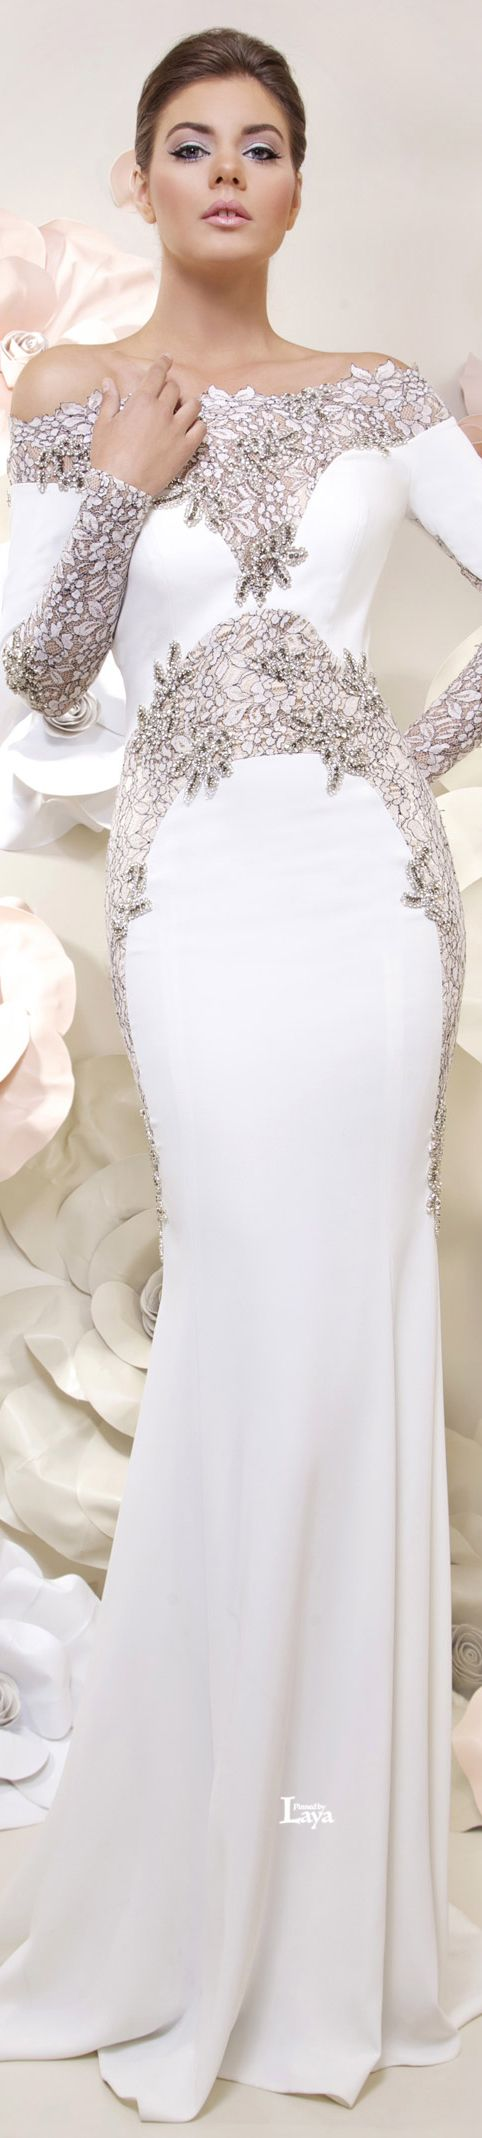 best elegance dress colors images on pinterest feminine